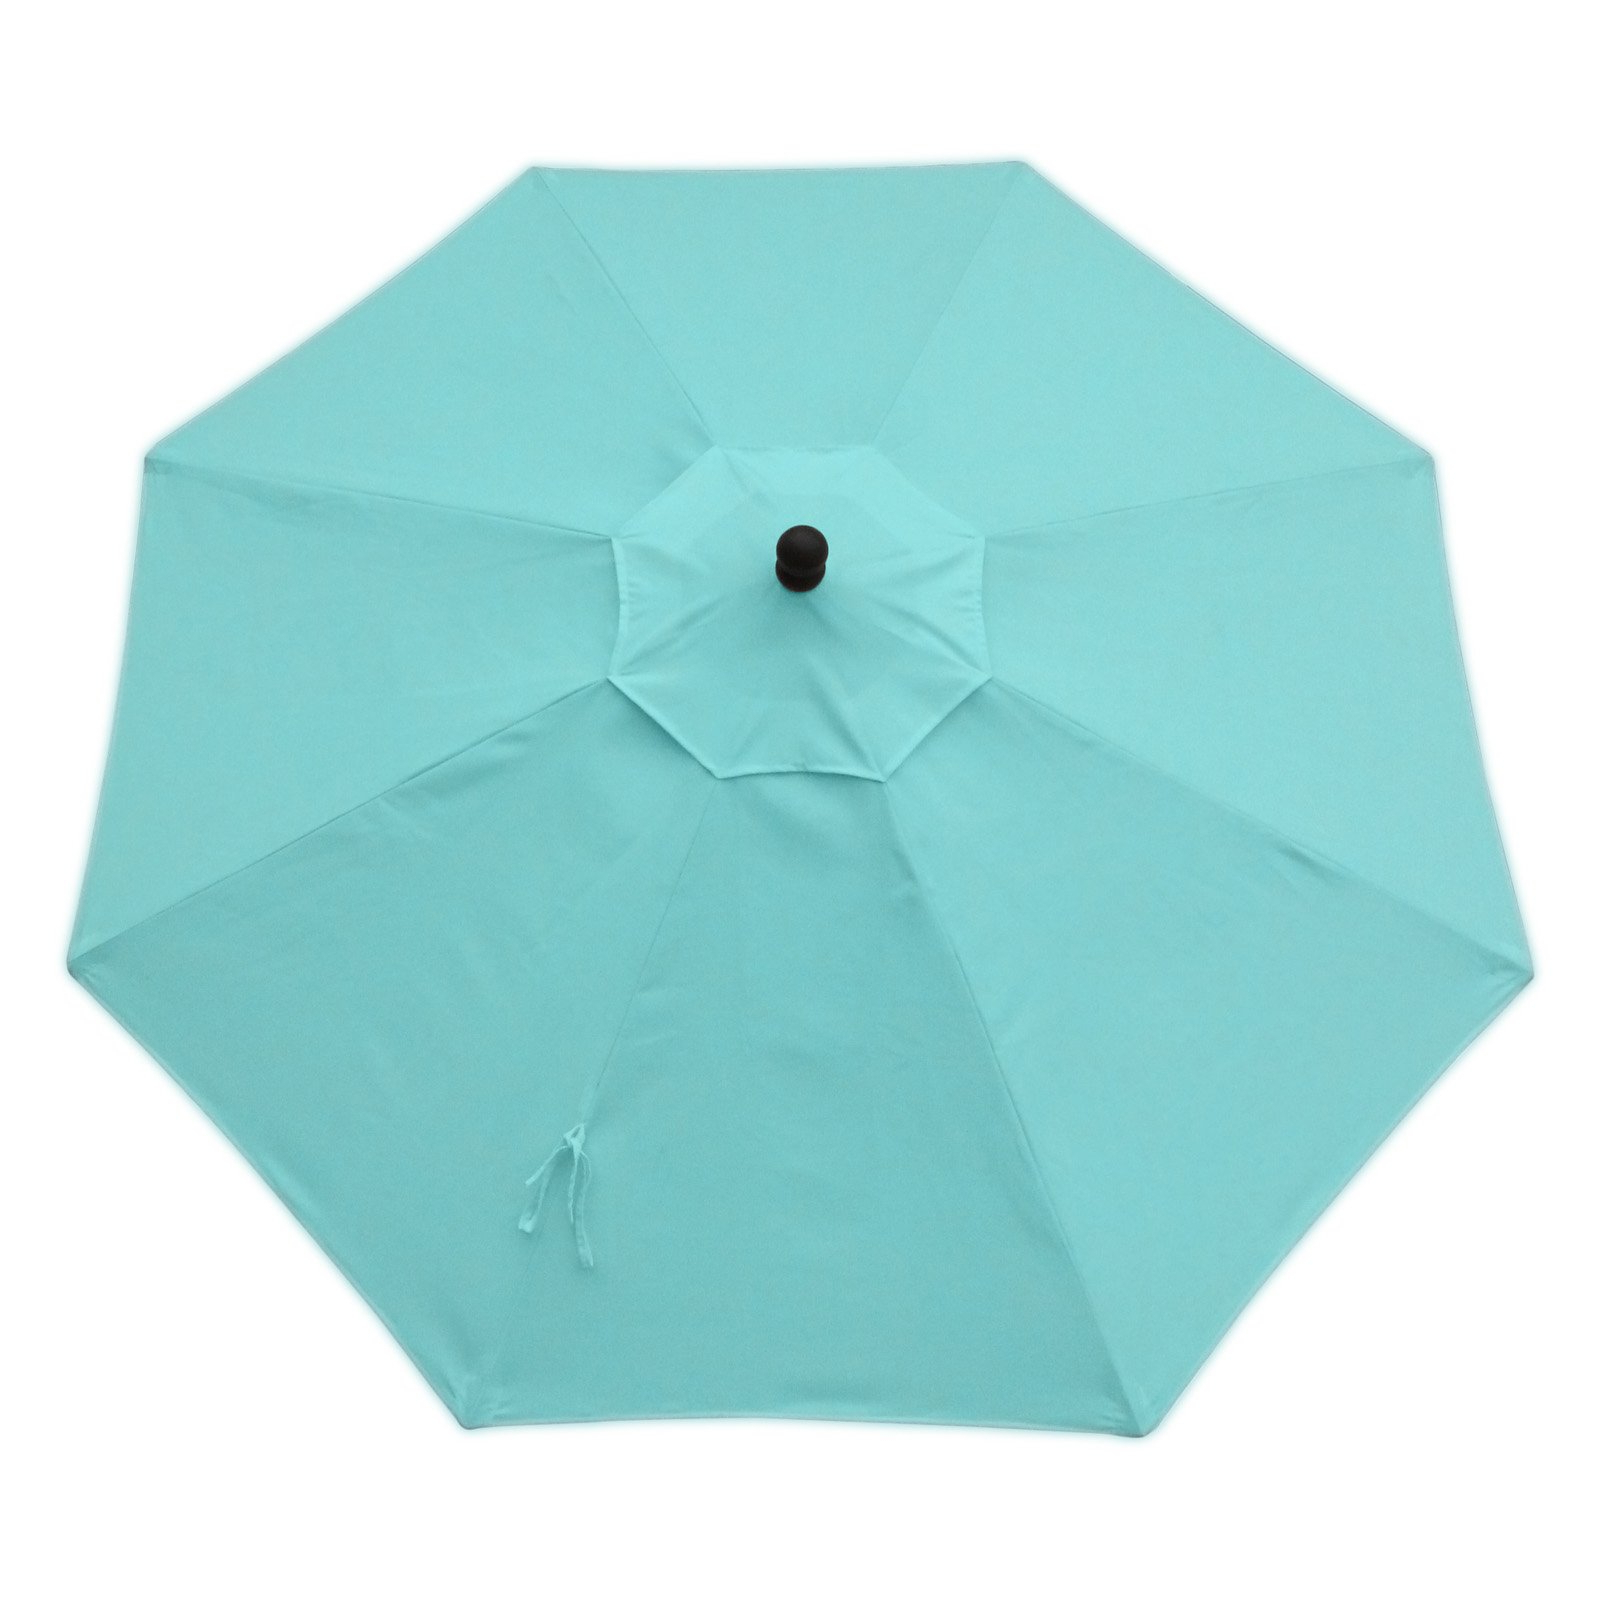 Wiechmann Push Tilt Market Sunbrella Umbrellas With Regard To Most Recent Bellini Resort 9' Market Umbrella Fabric: Canvas Heather Beige (View 20 of 20)